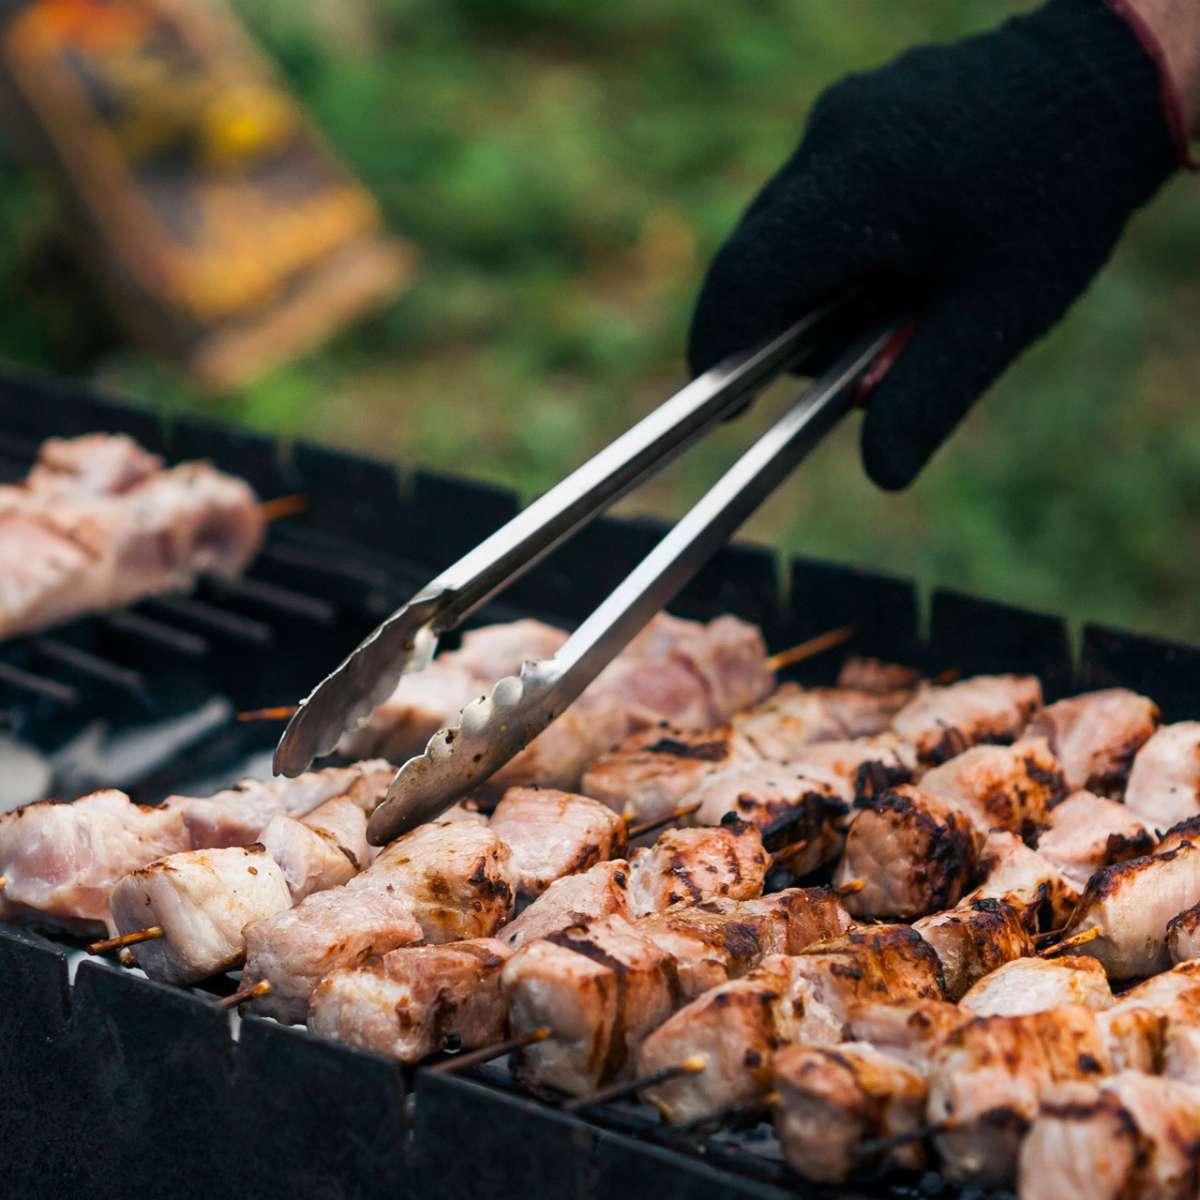 marinated-shashlik-meat-grilling-on-metal-skewer-c-PWDYUJE